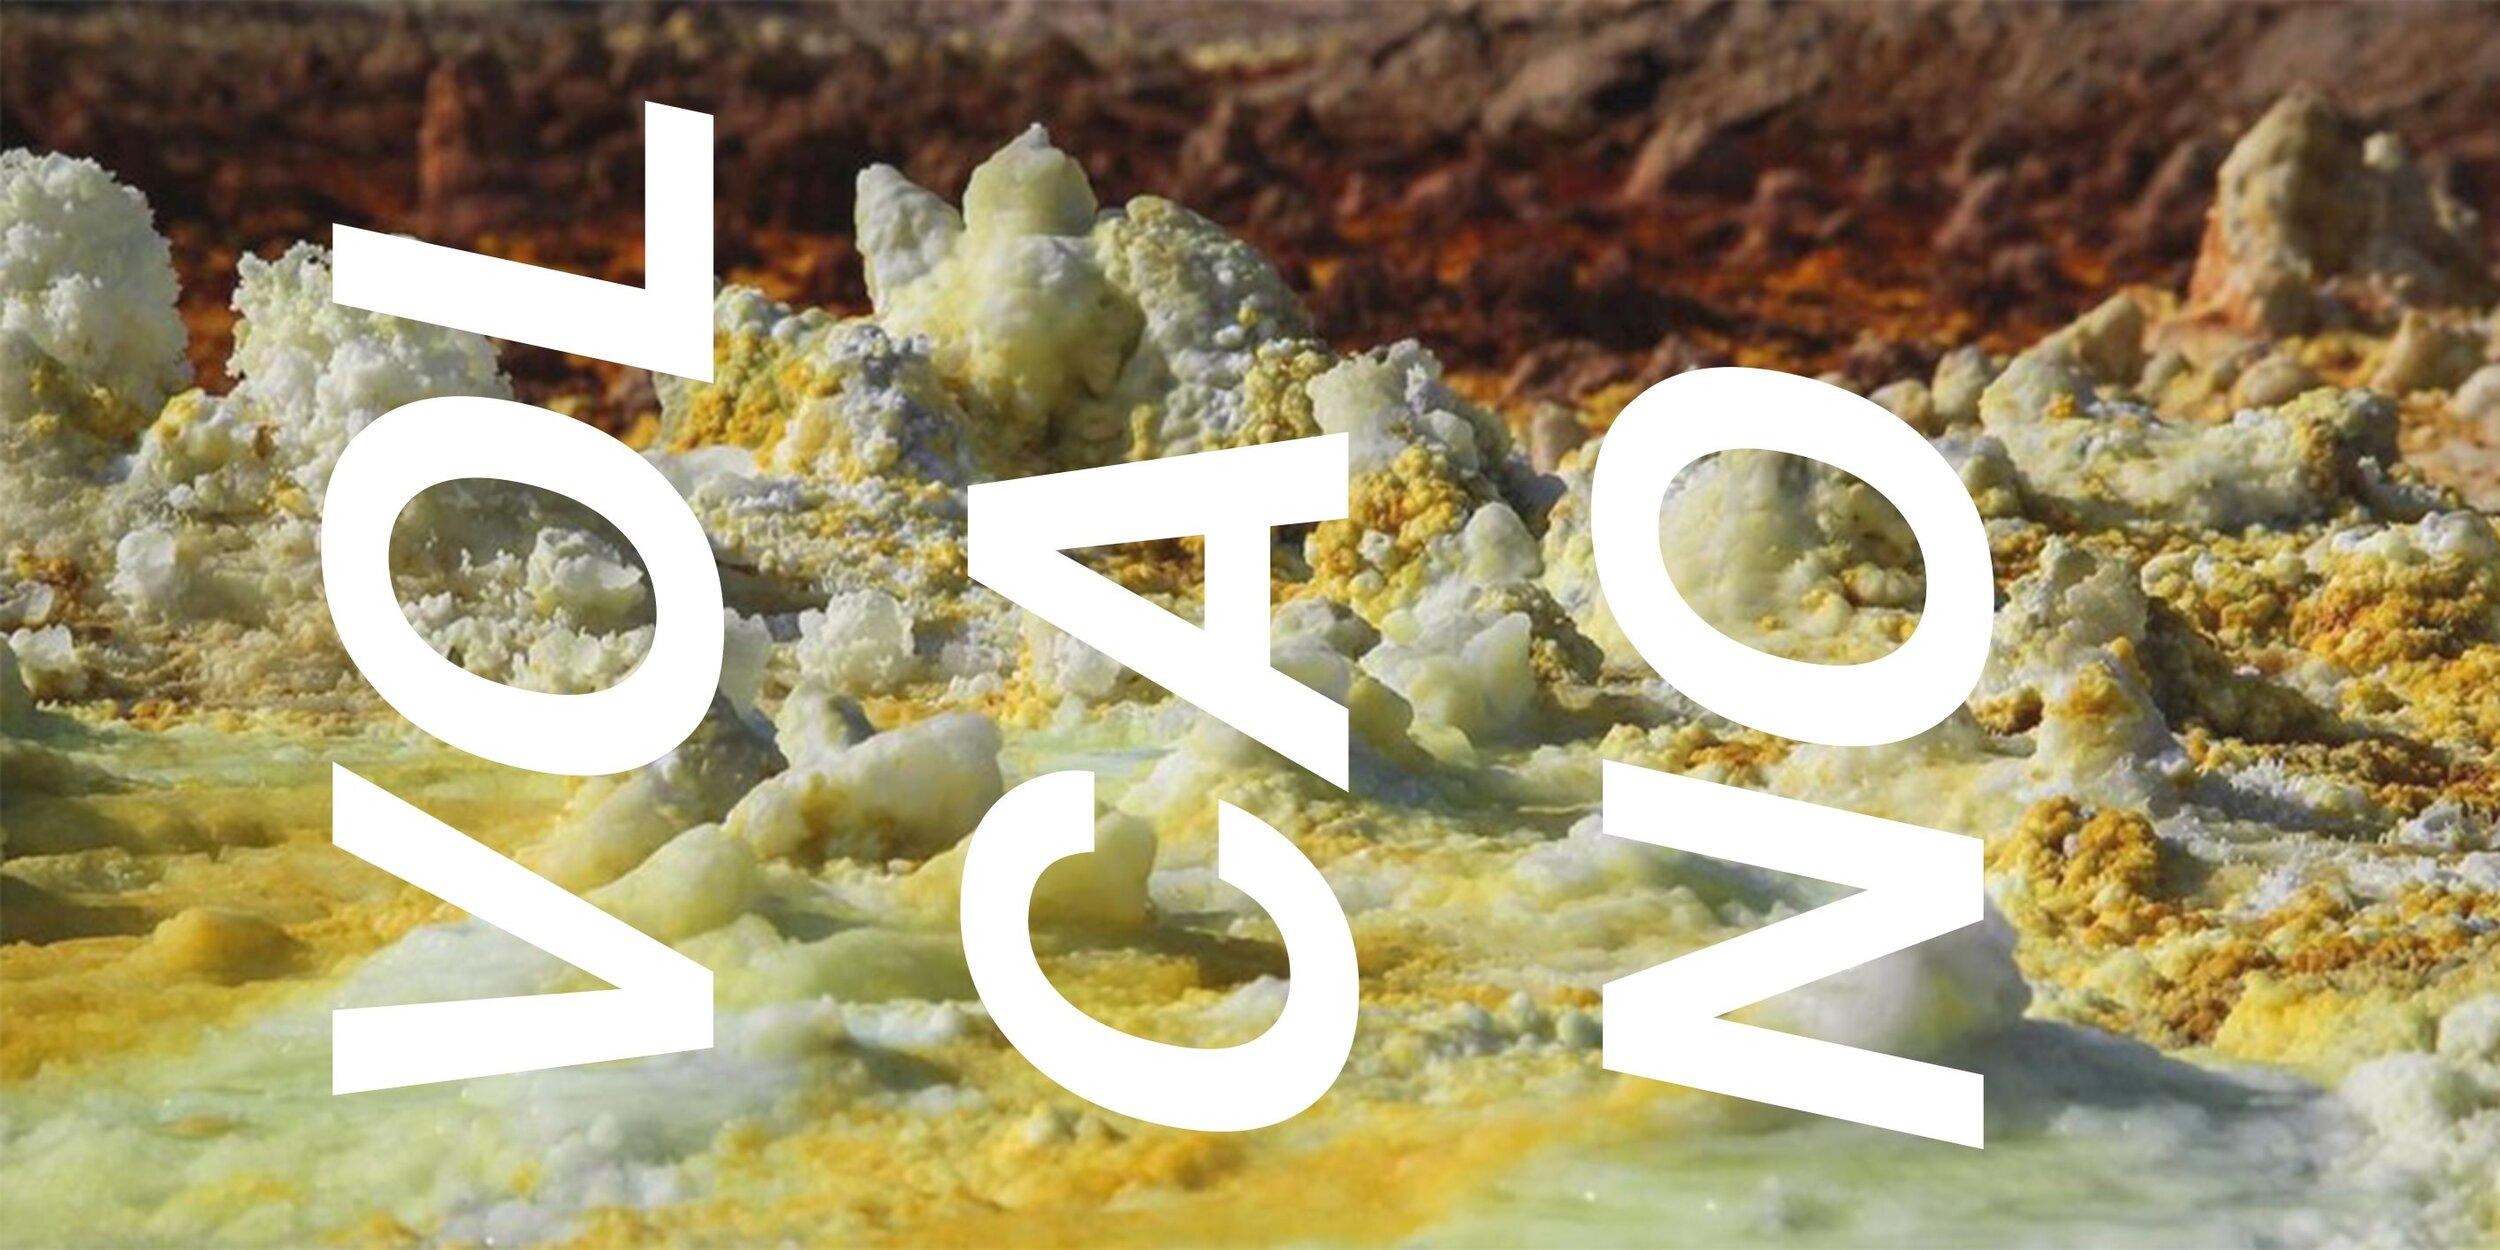 Disintegration .  2019. Whitechapel Gallery, London.. Rachel Pimm and Lori E Allen.  Spoken text and sound.  Image by Rachel Pimm.